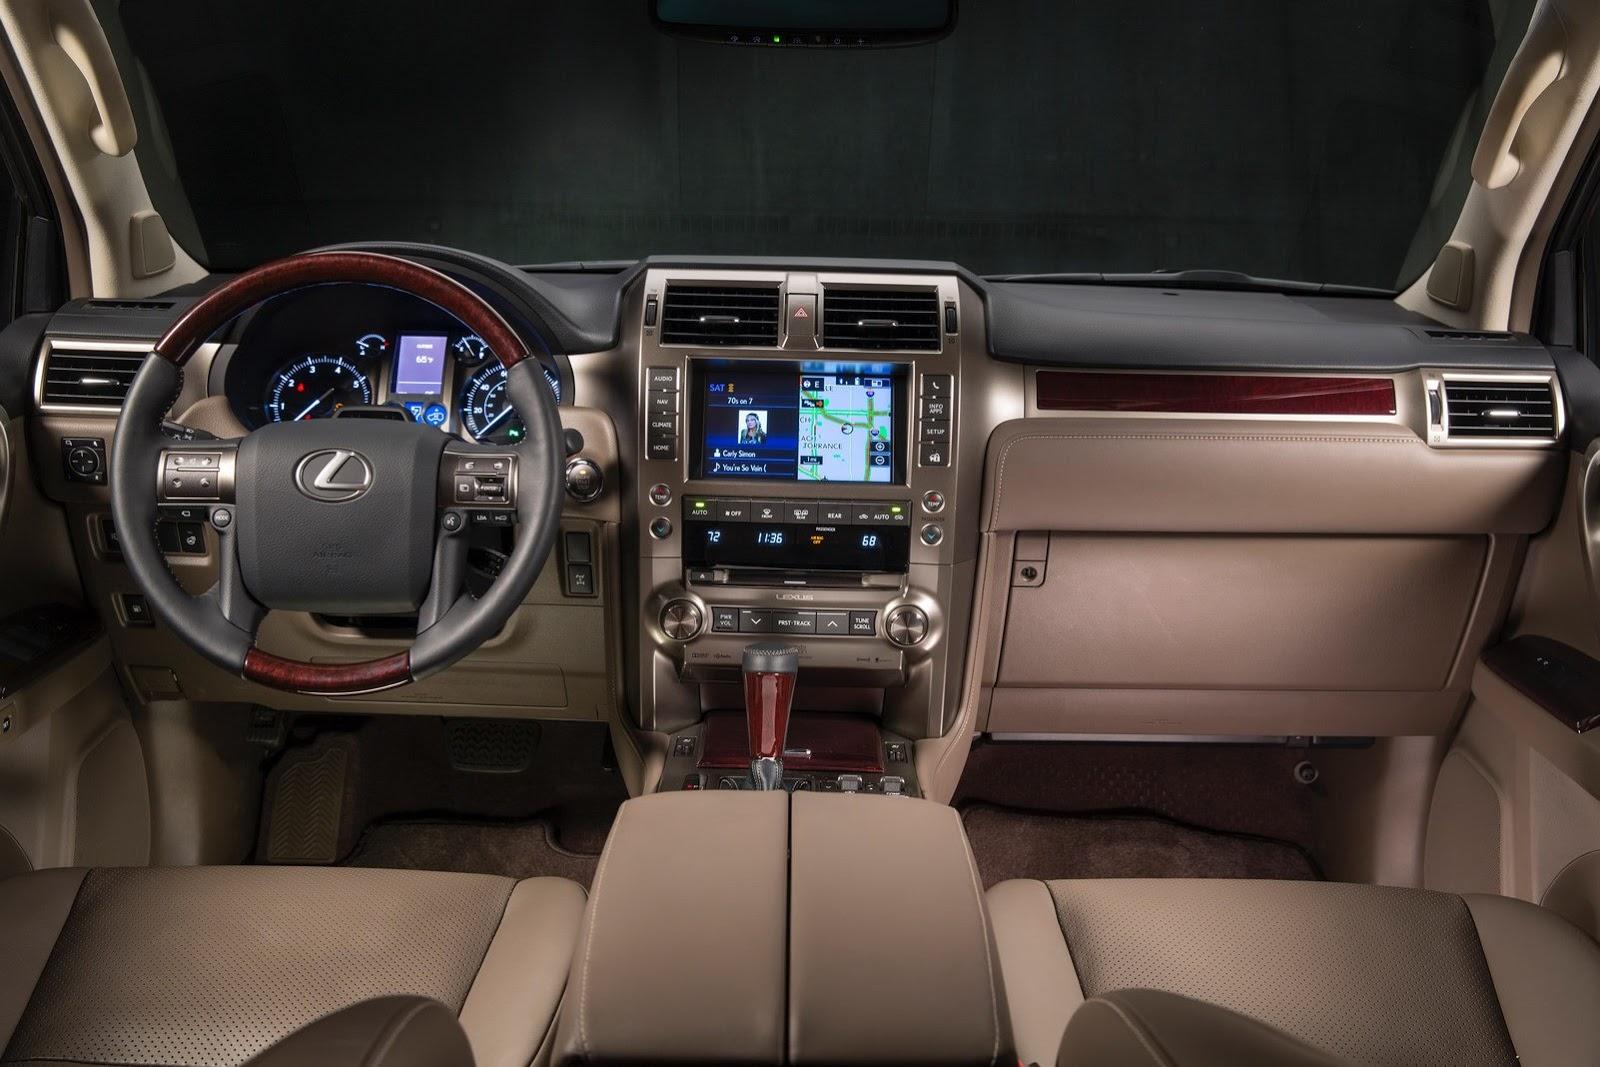 2009/13 - [Toyota/Lexus] Land Cruiser / GX Restylés - Page 4 2014-Lexus-GX-Facelift-8%252524%25255B2%25255D